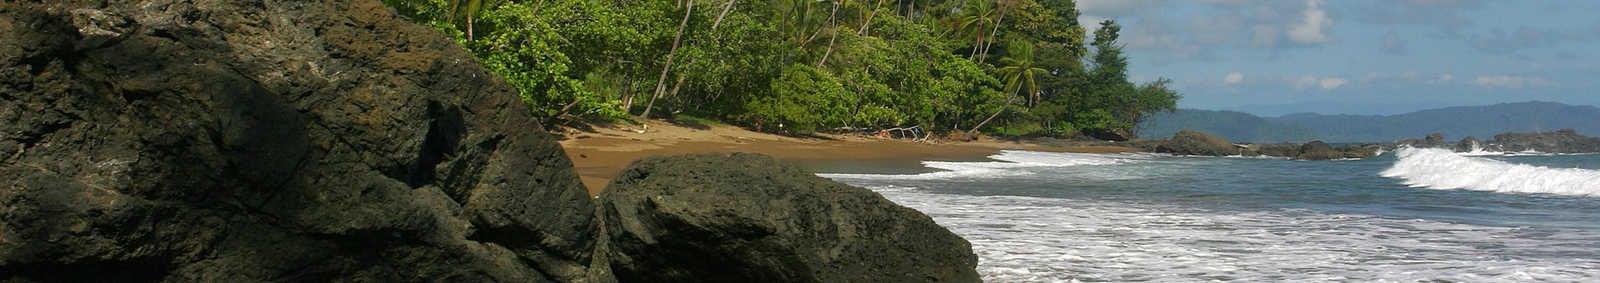 Pacific coast in Corcovado park, Costa Rica